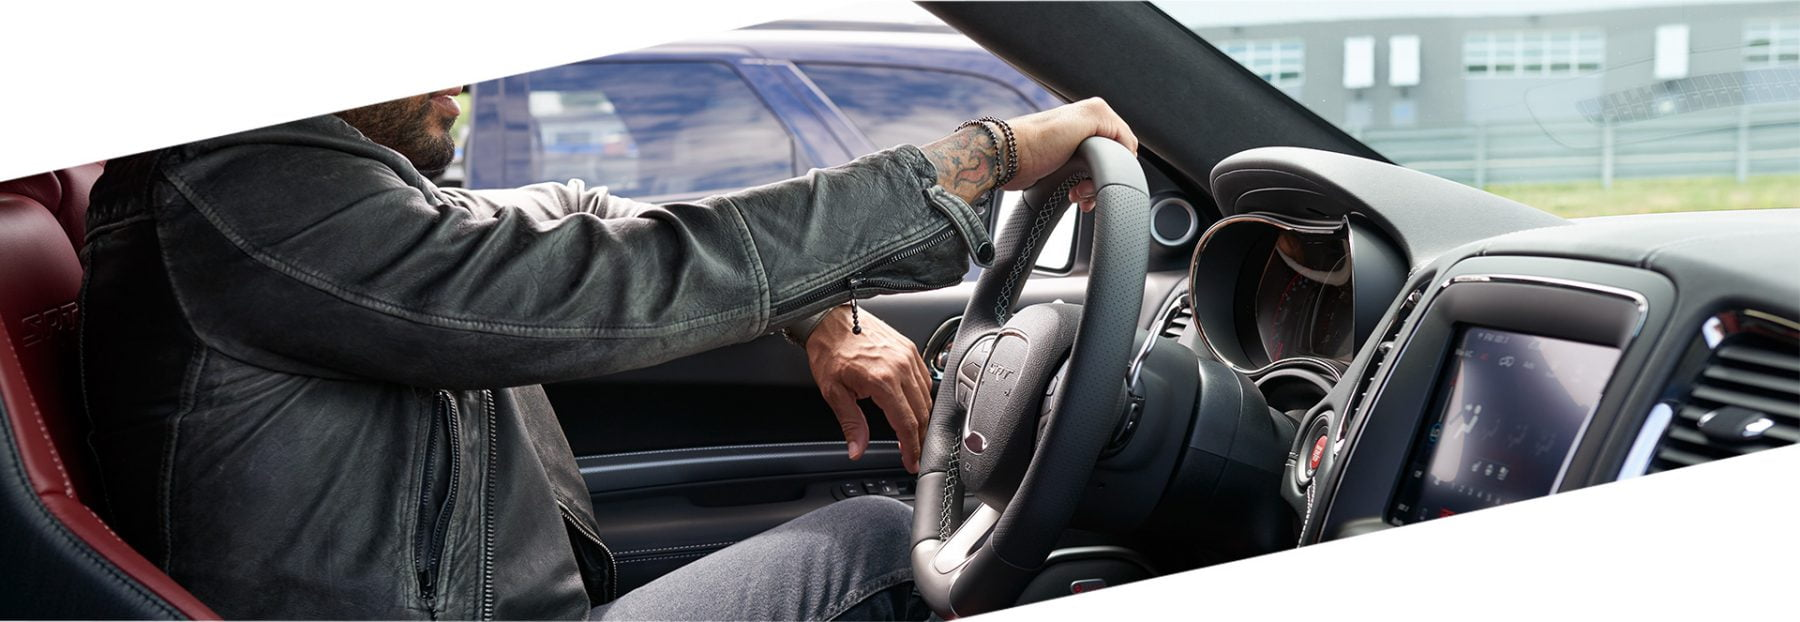 Man drives Dodge Durango SRT